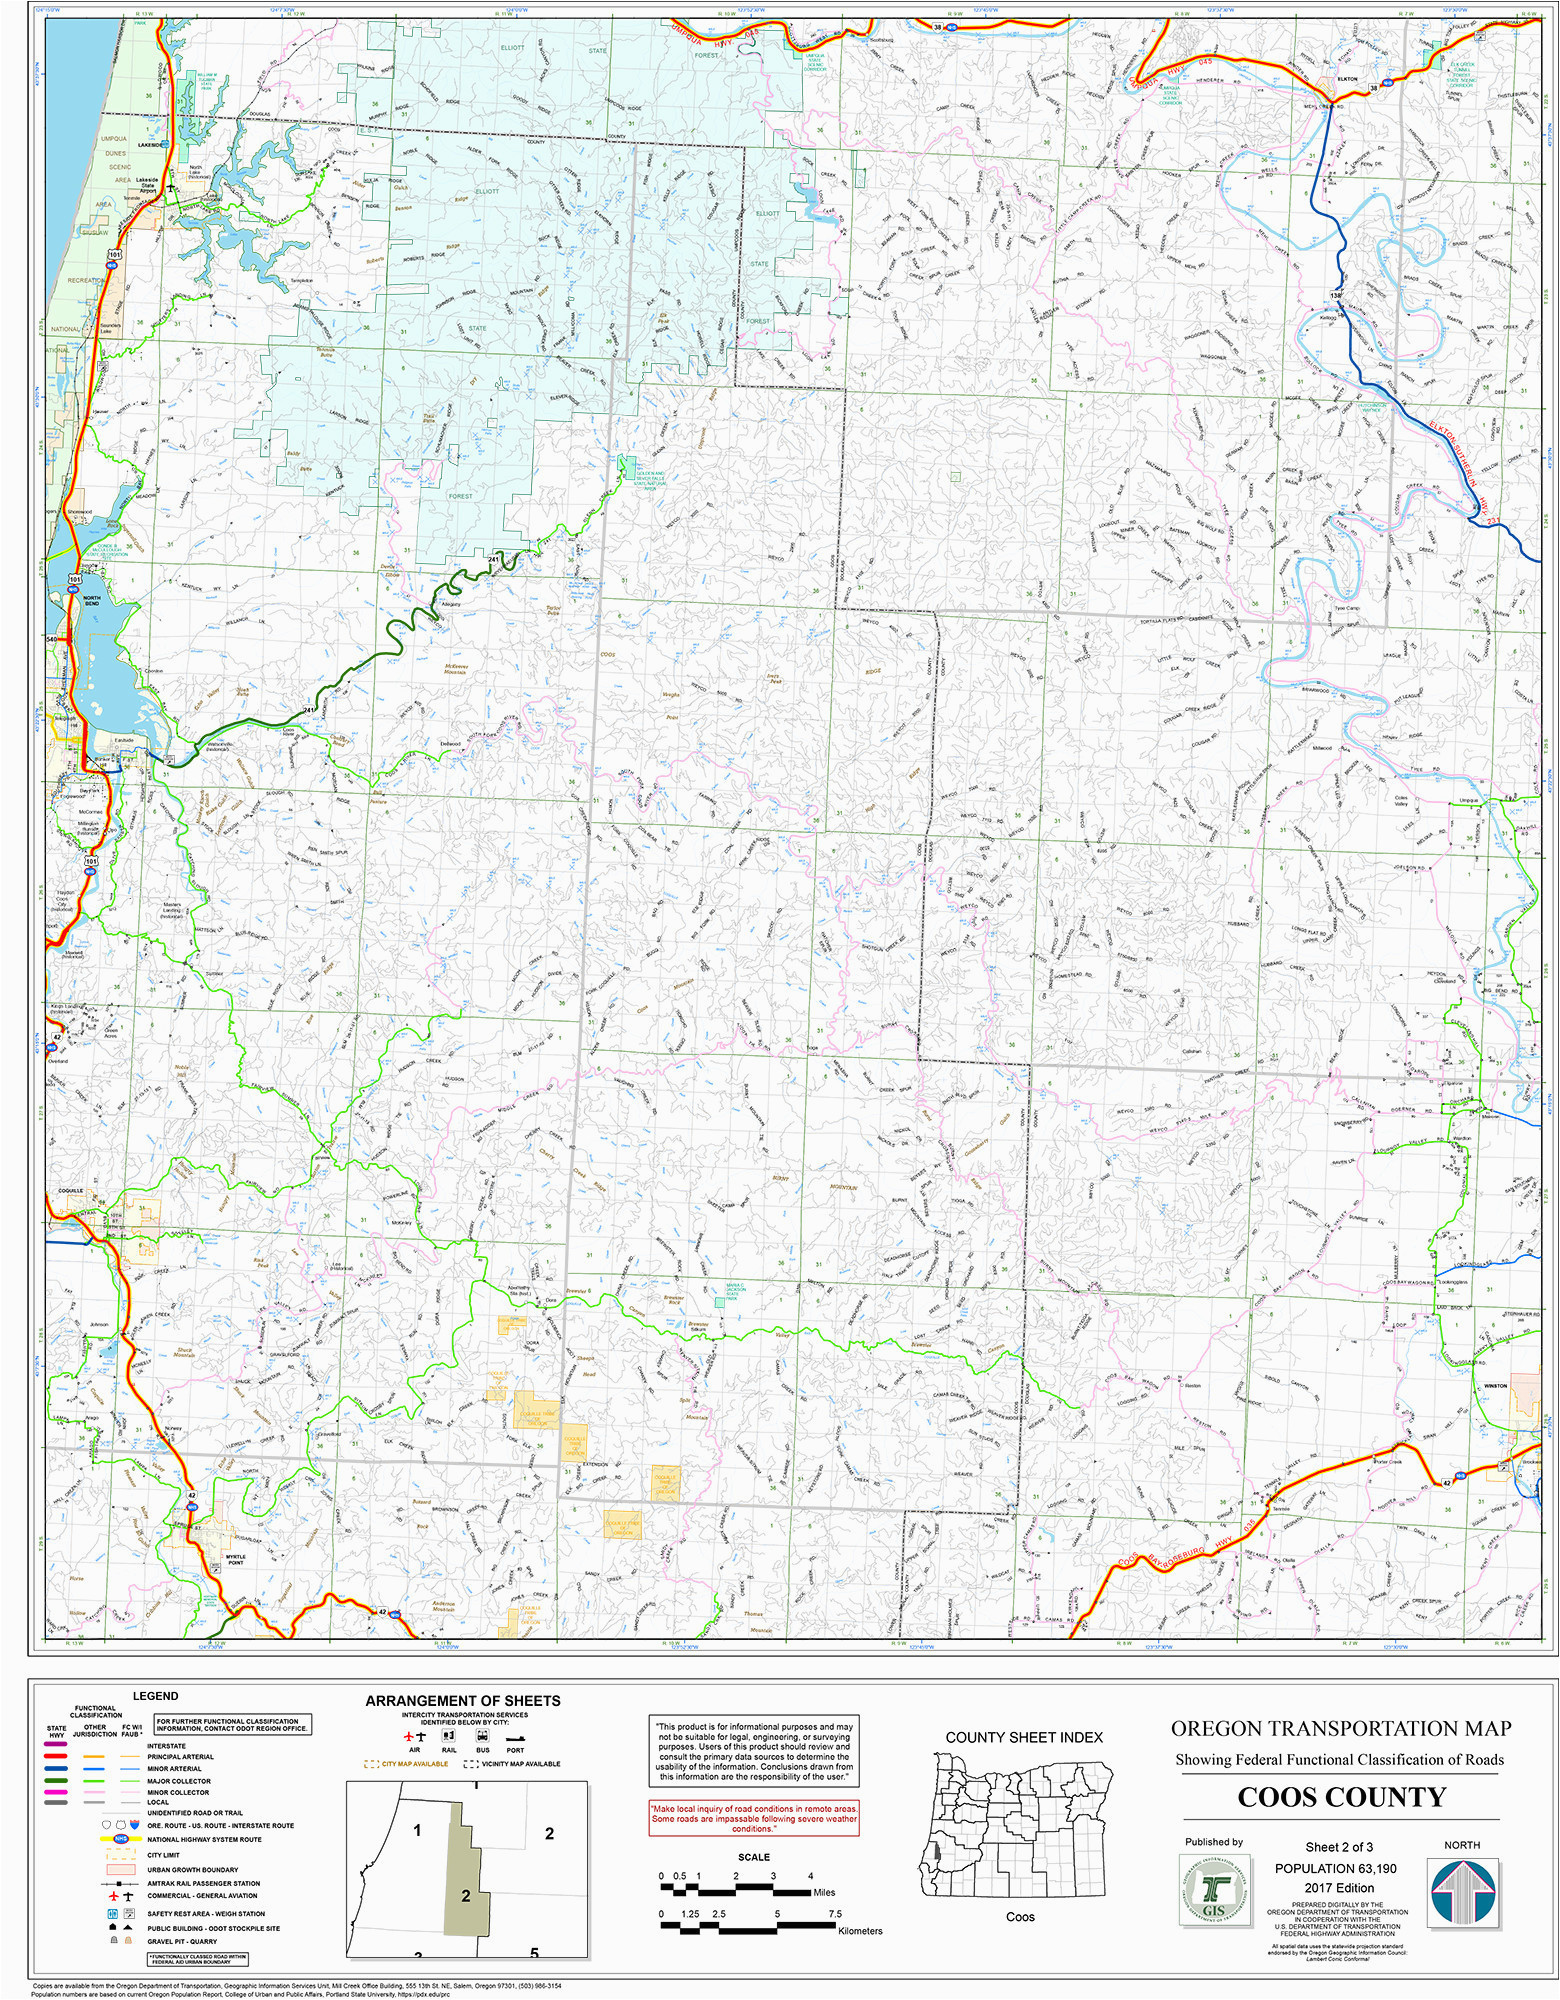 image regarding Printable Map of Arkansas titled Google Maps Oakland California Google Maps Arkansas Great Of